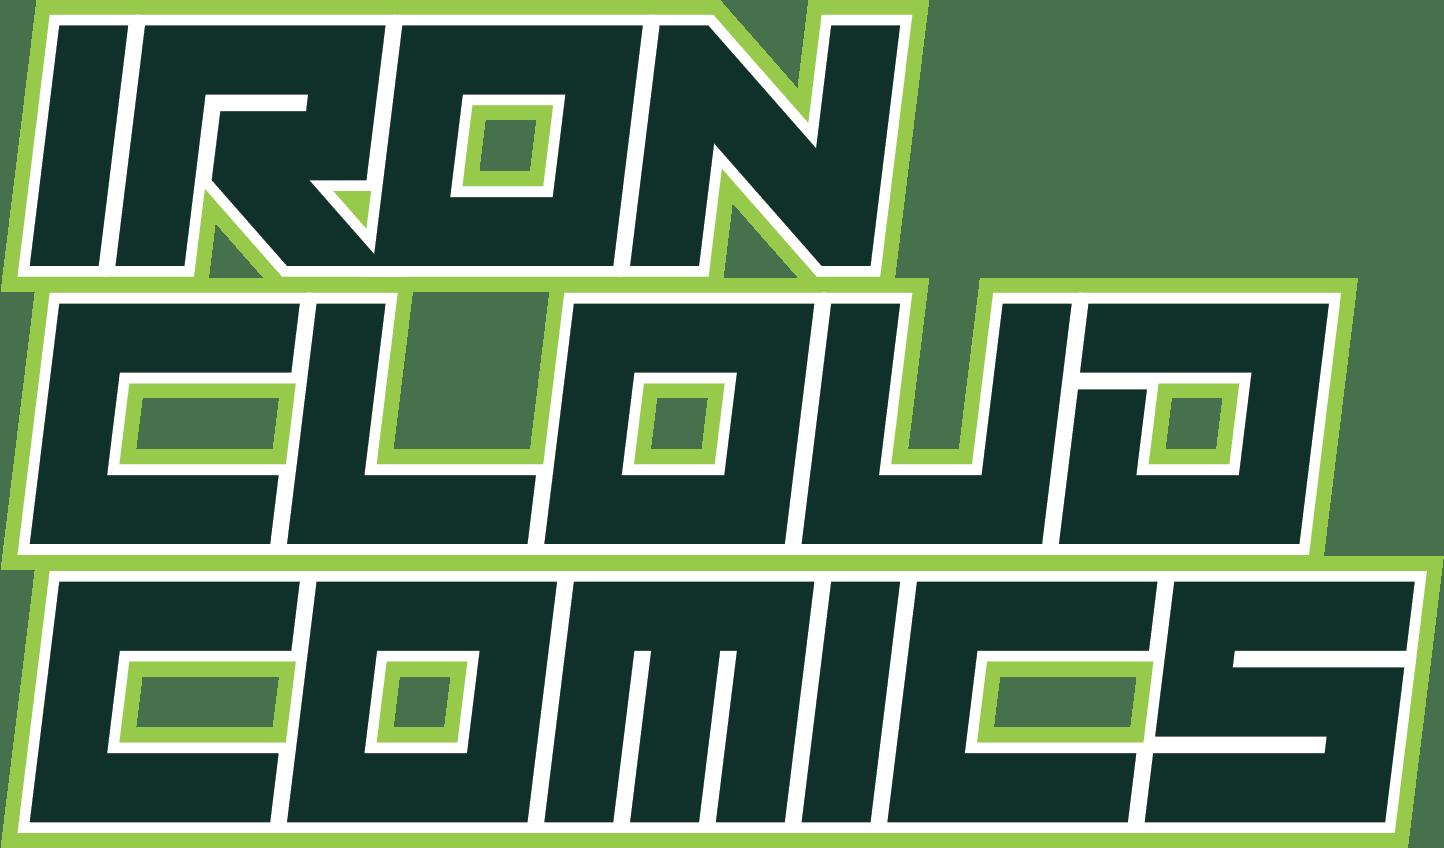 IronCloudComics